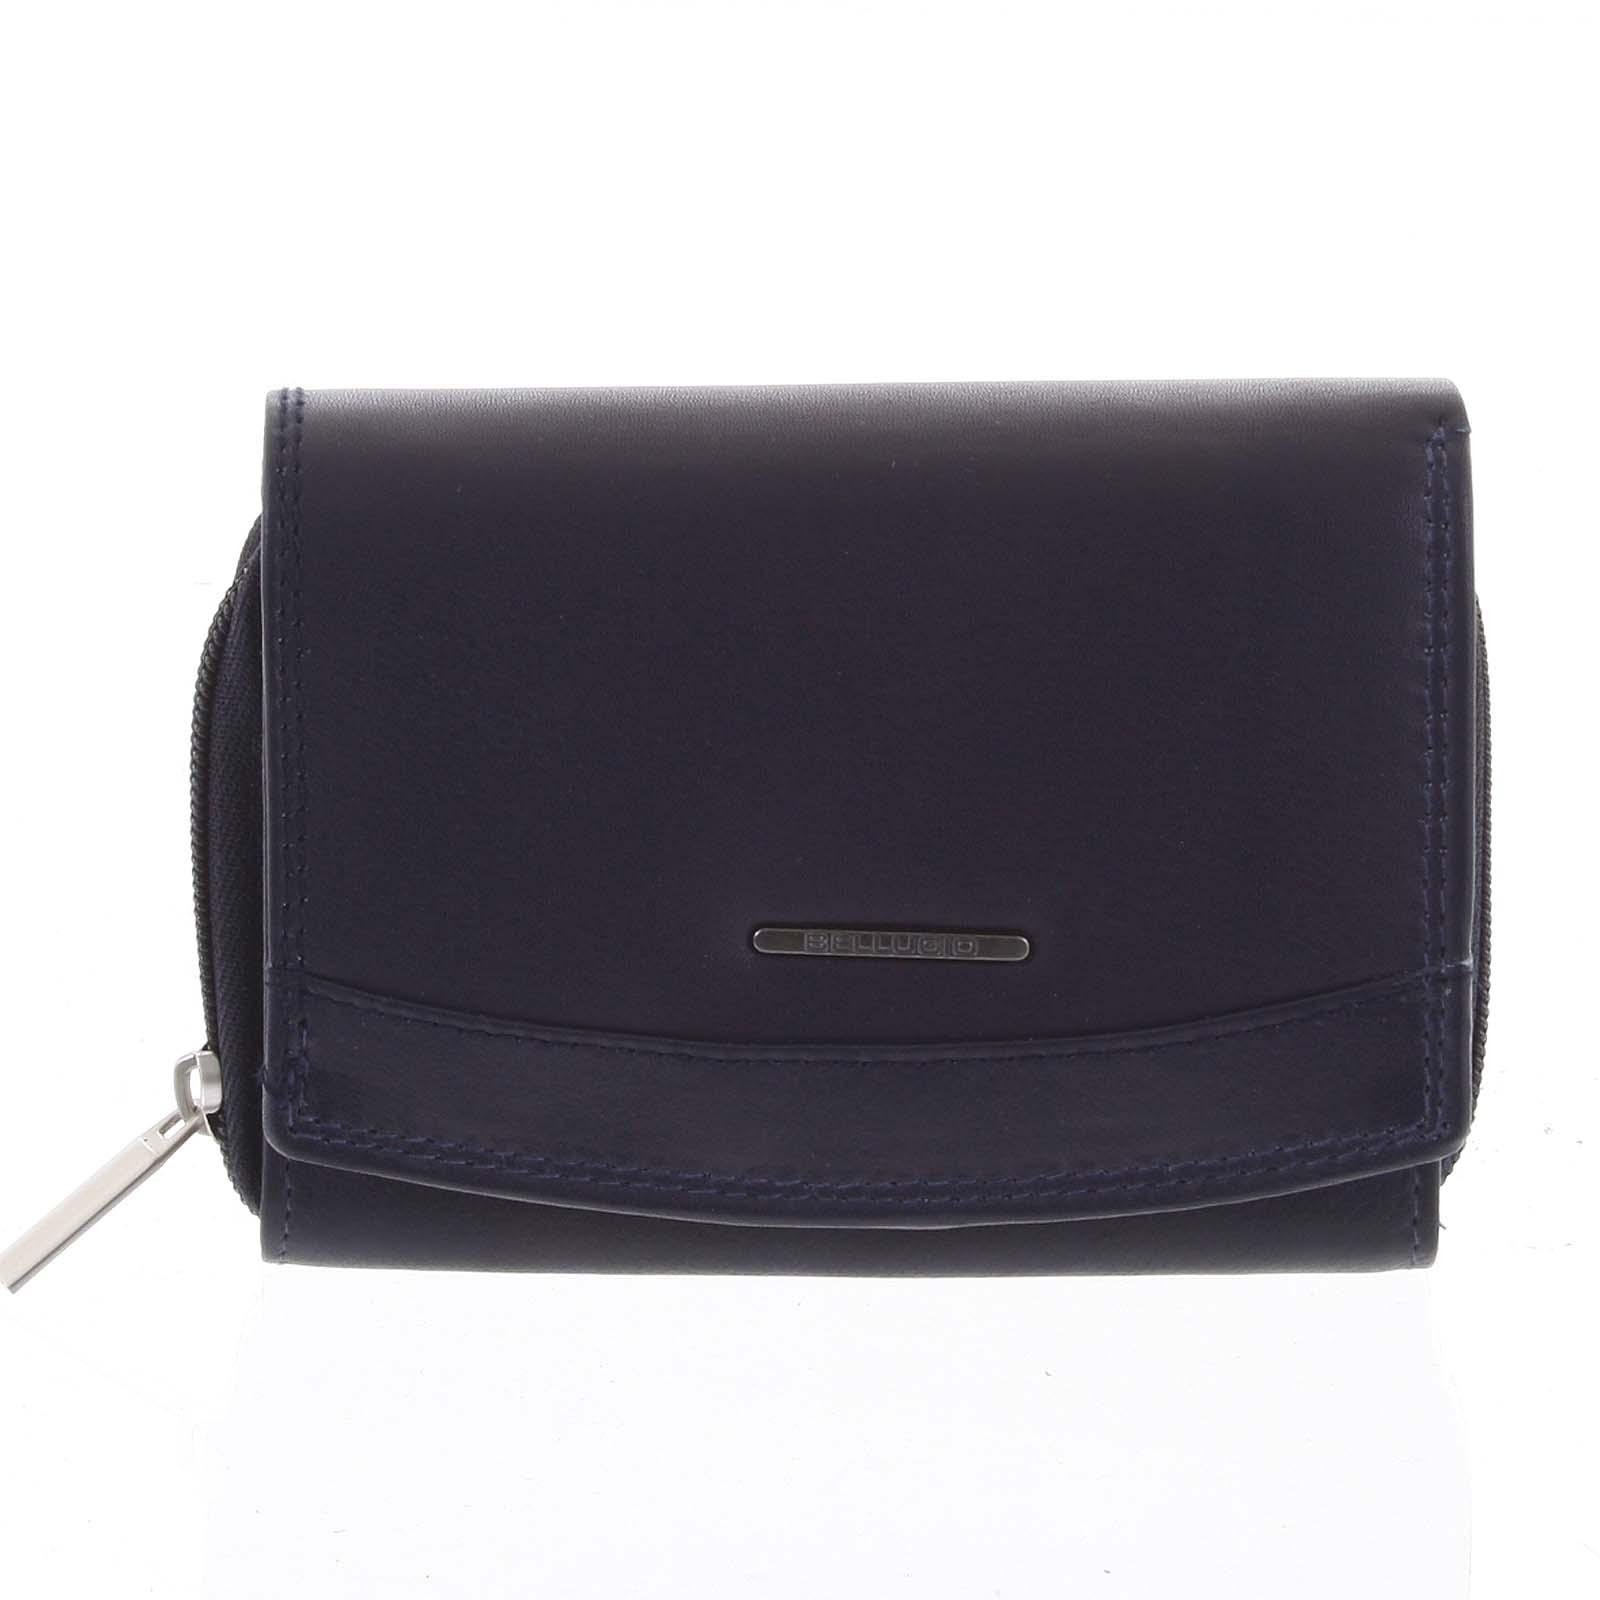 Dámská kožená peněženka modrá - Bellugio Smith